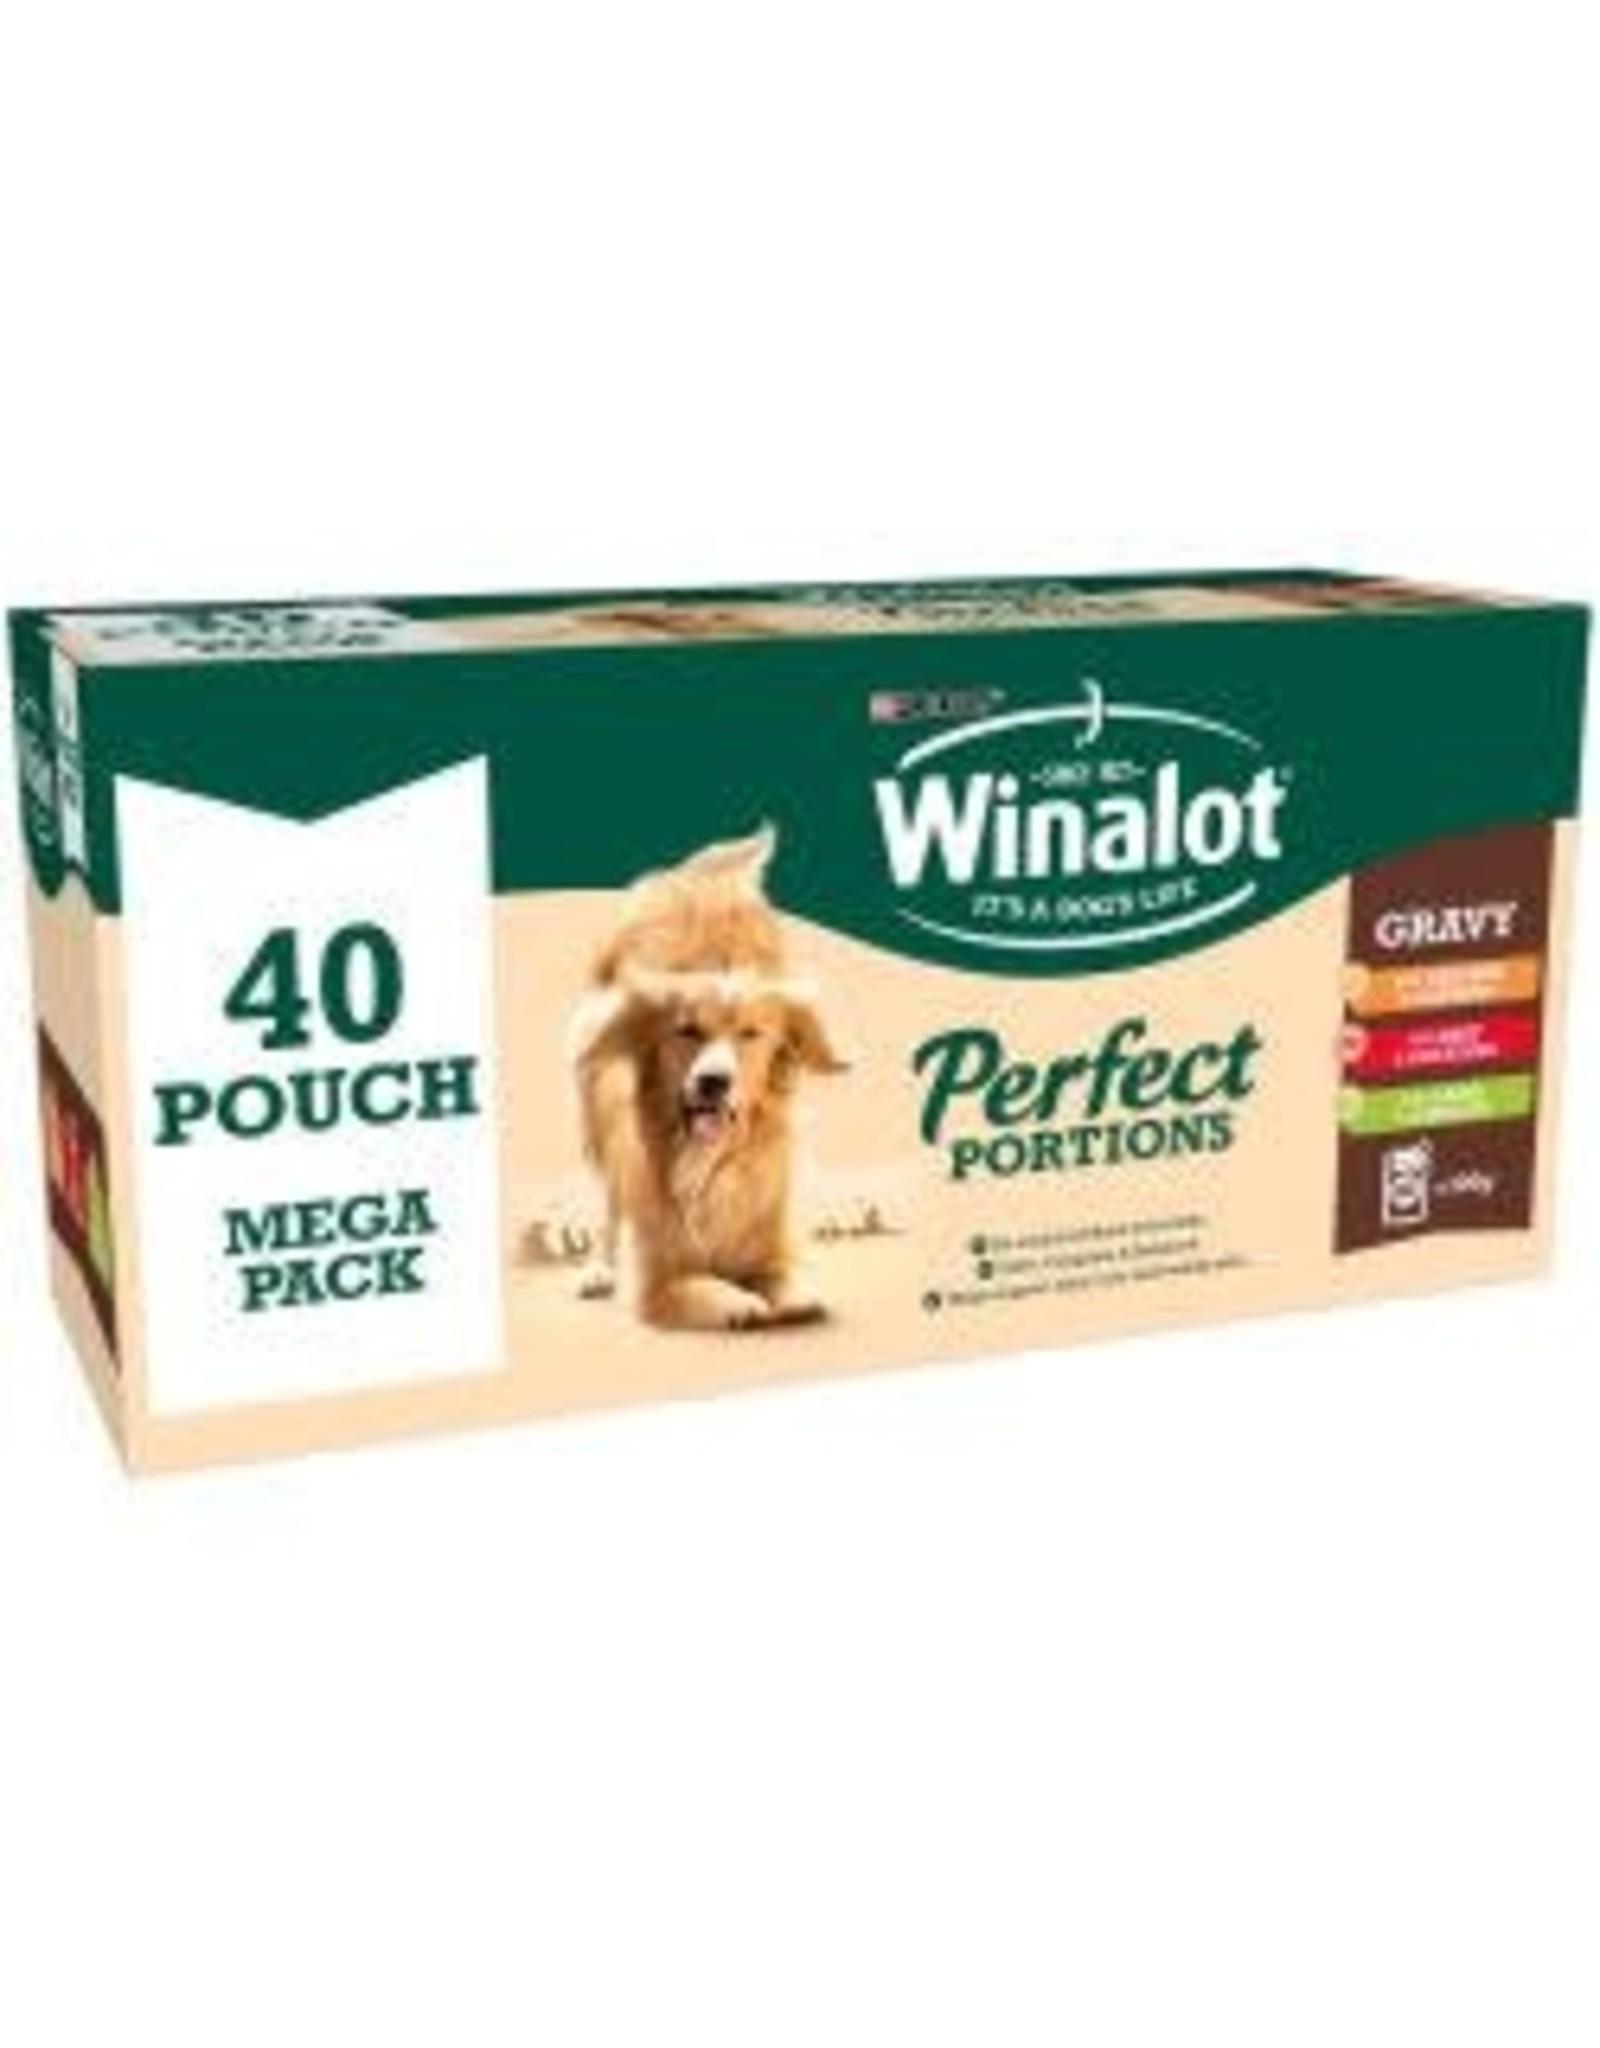 Winalot Winalot Pouch Mixed Chunks In Gravy 40 Pack